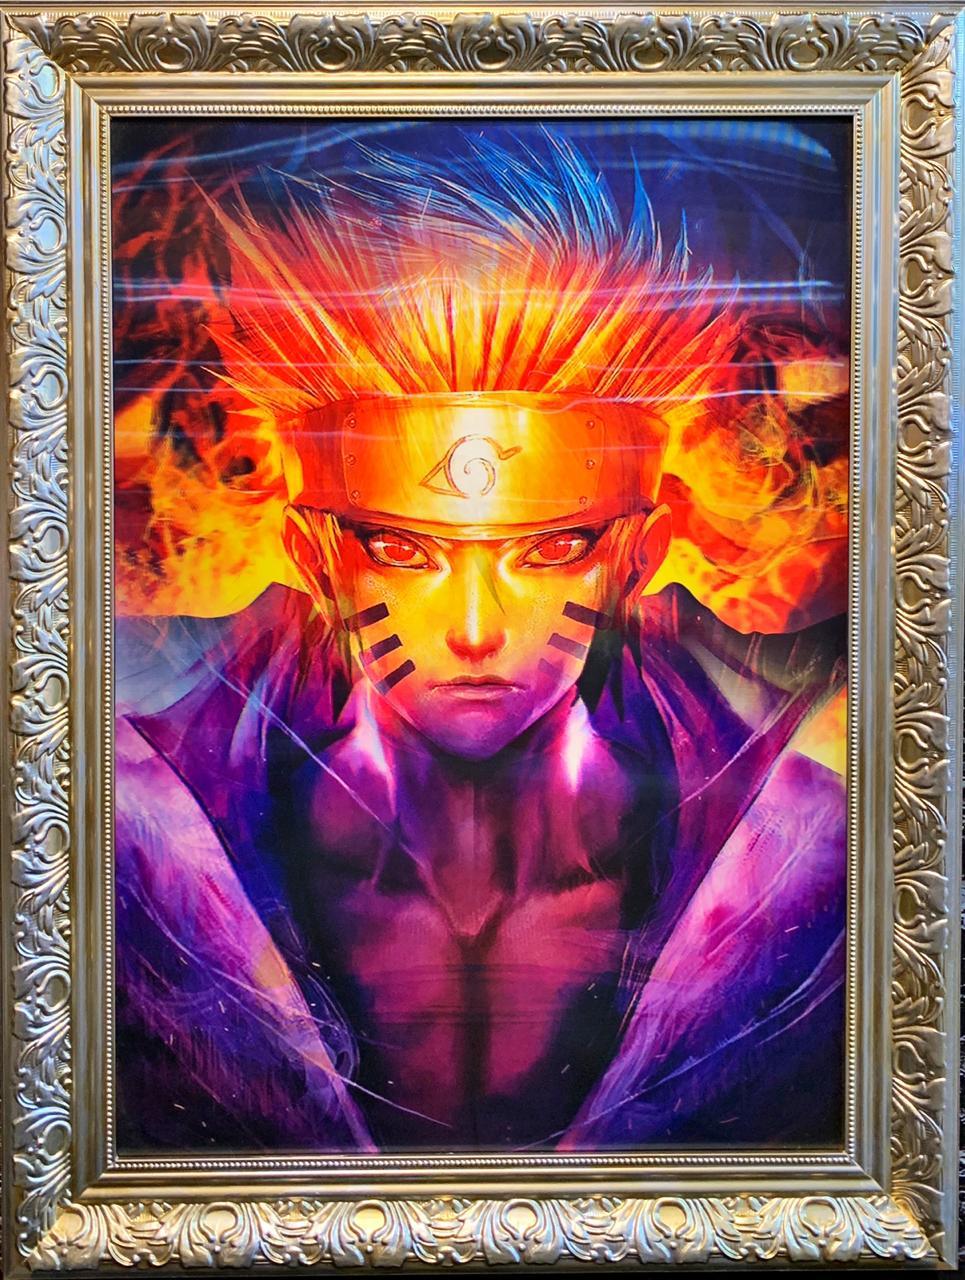 Poster (Quadro) 3D Lenticular (Com Moldura) Naruto: Naruto Shippuden (80x60)